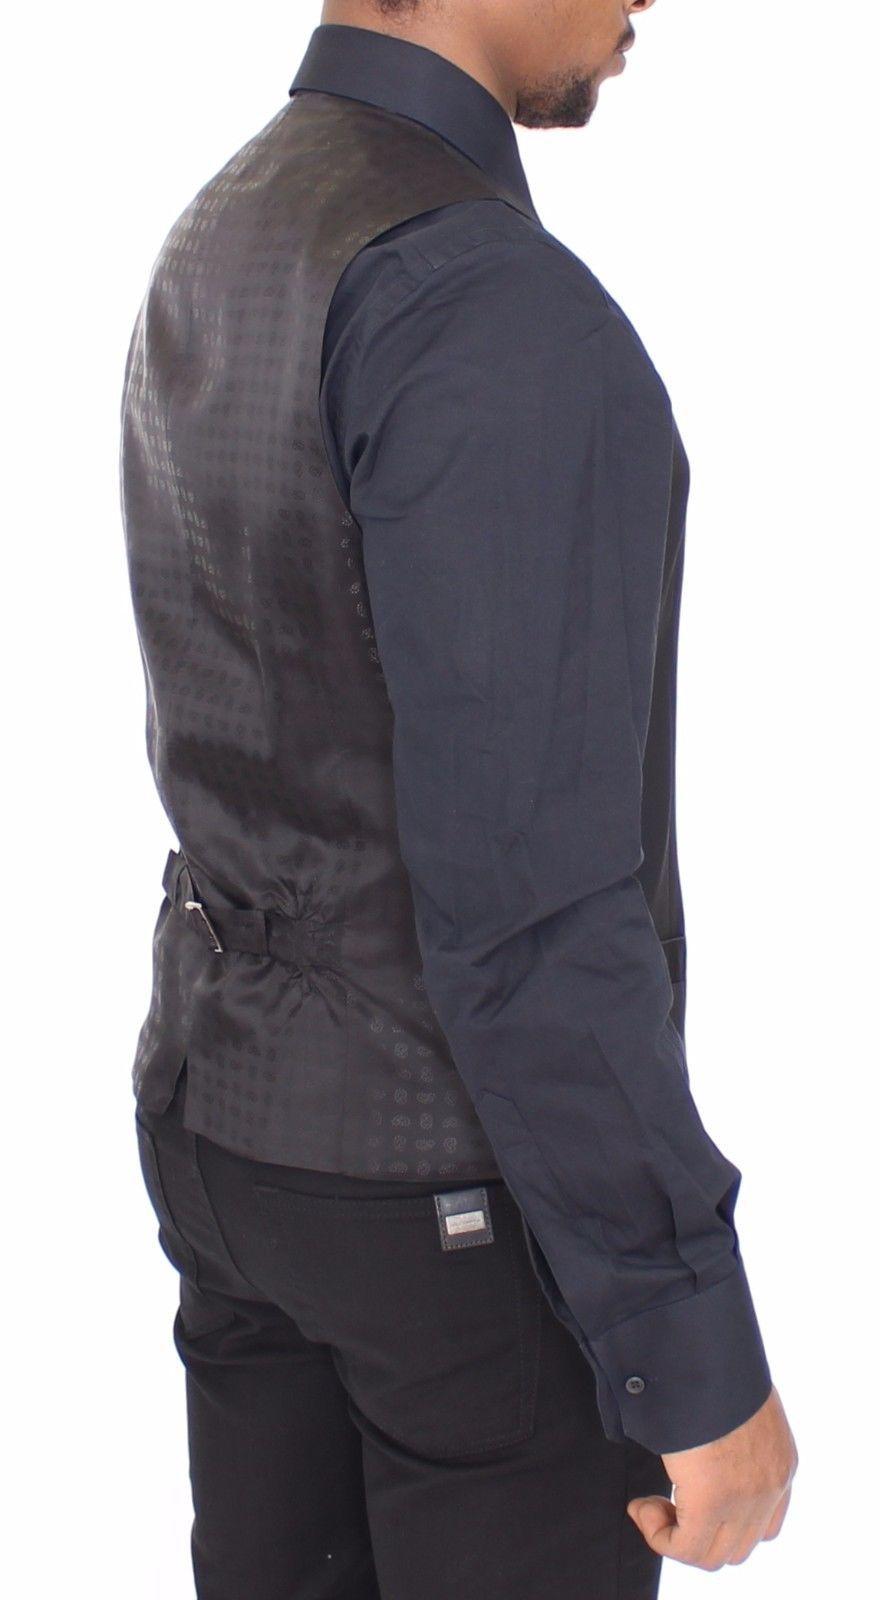 Dolce & Gabbana Black Wool Silk Dress Vest Gilet Jacket